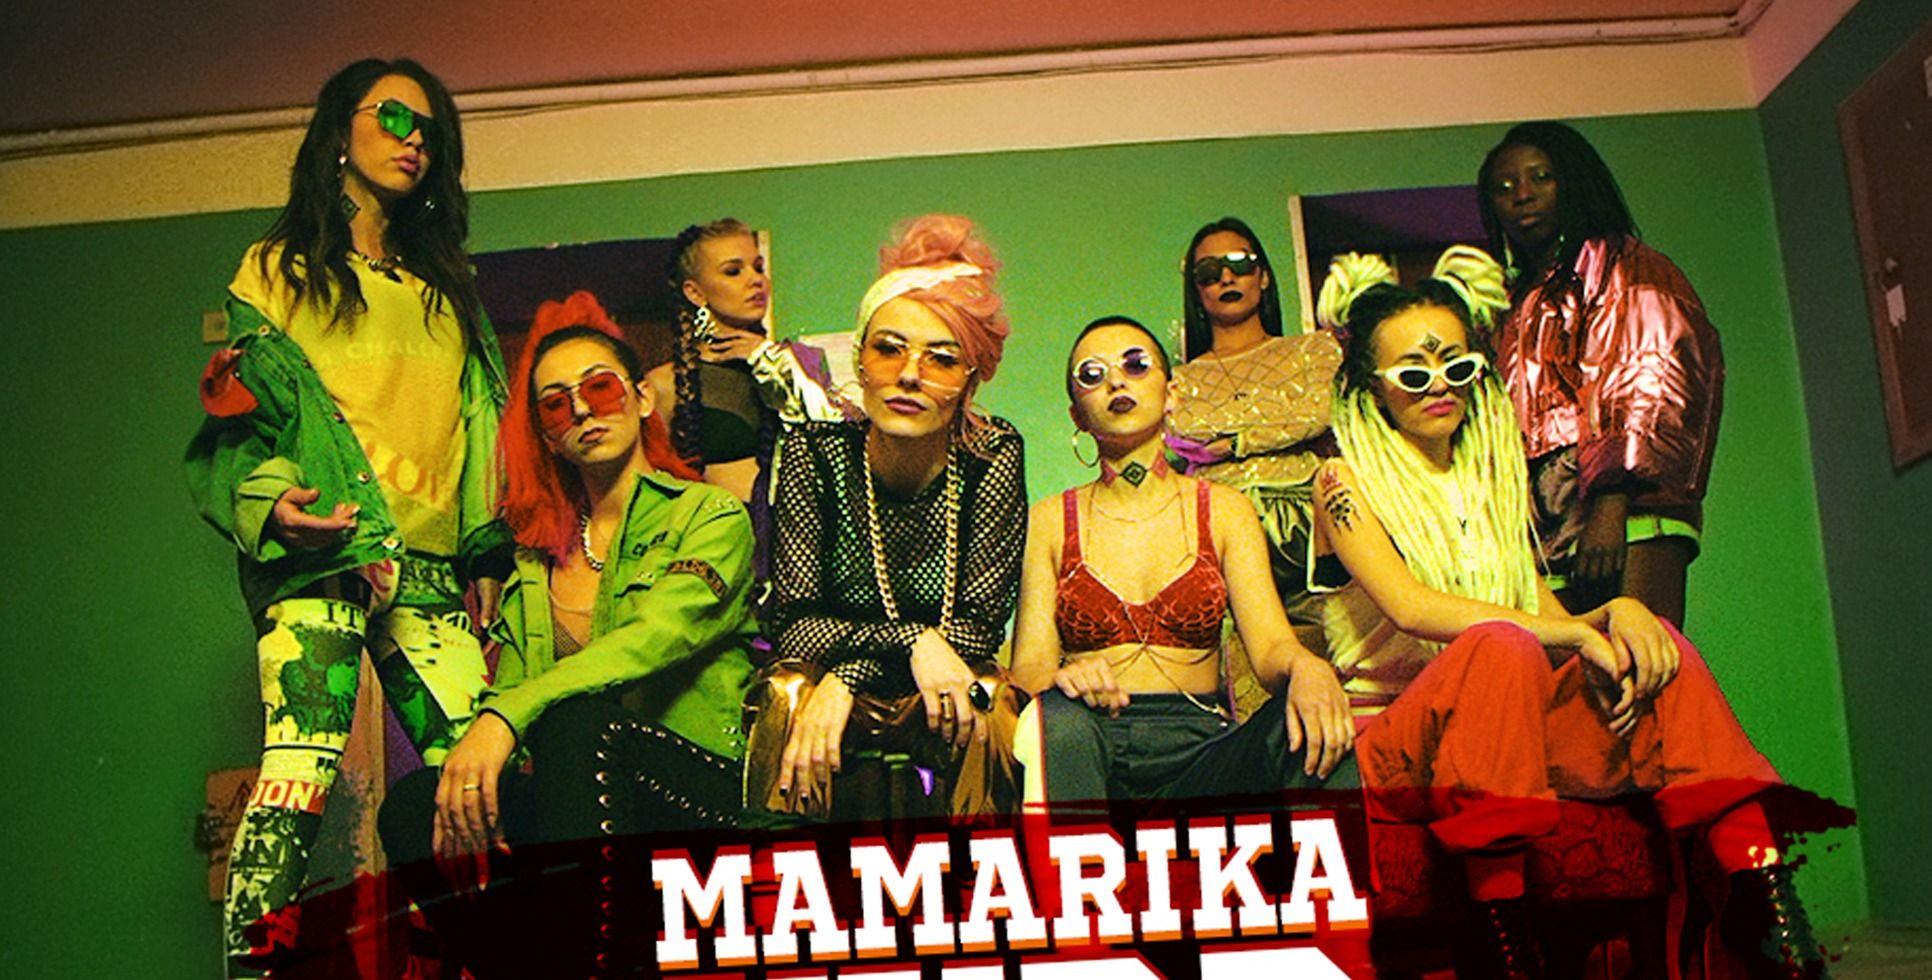 MamaRika презентовала клип на песню ХХДД